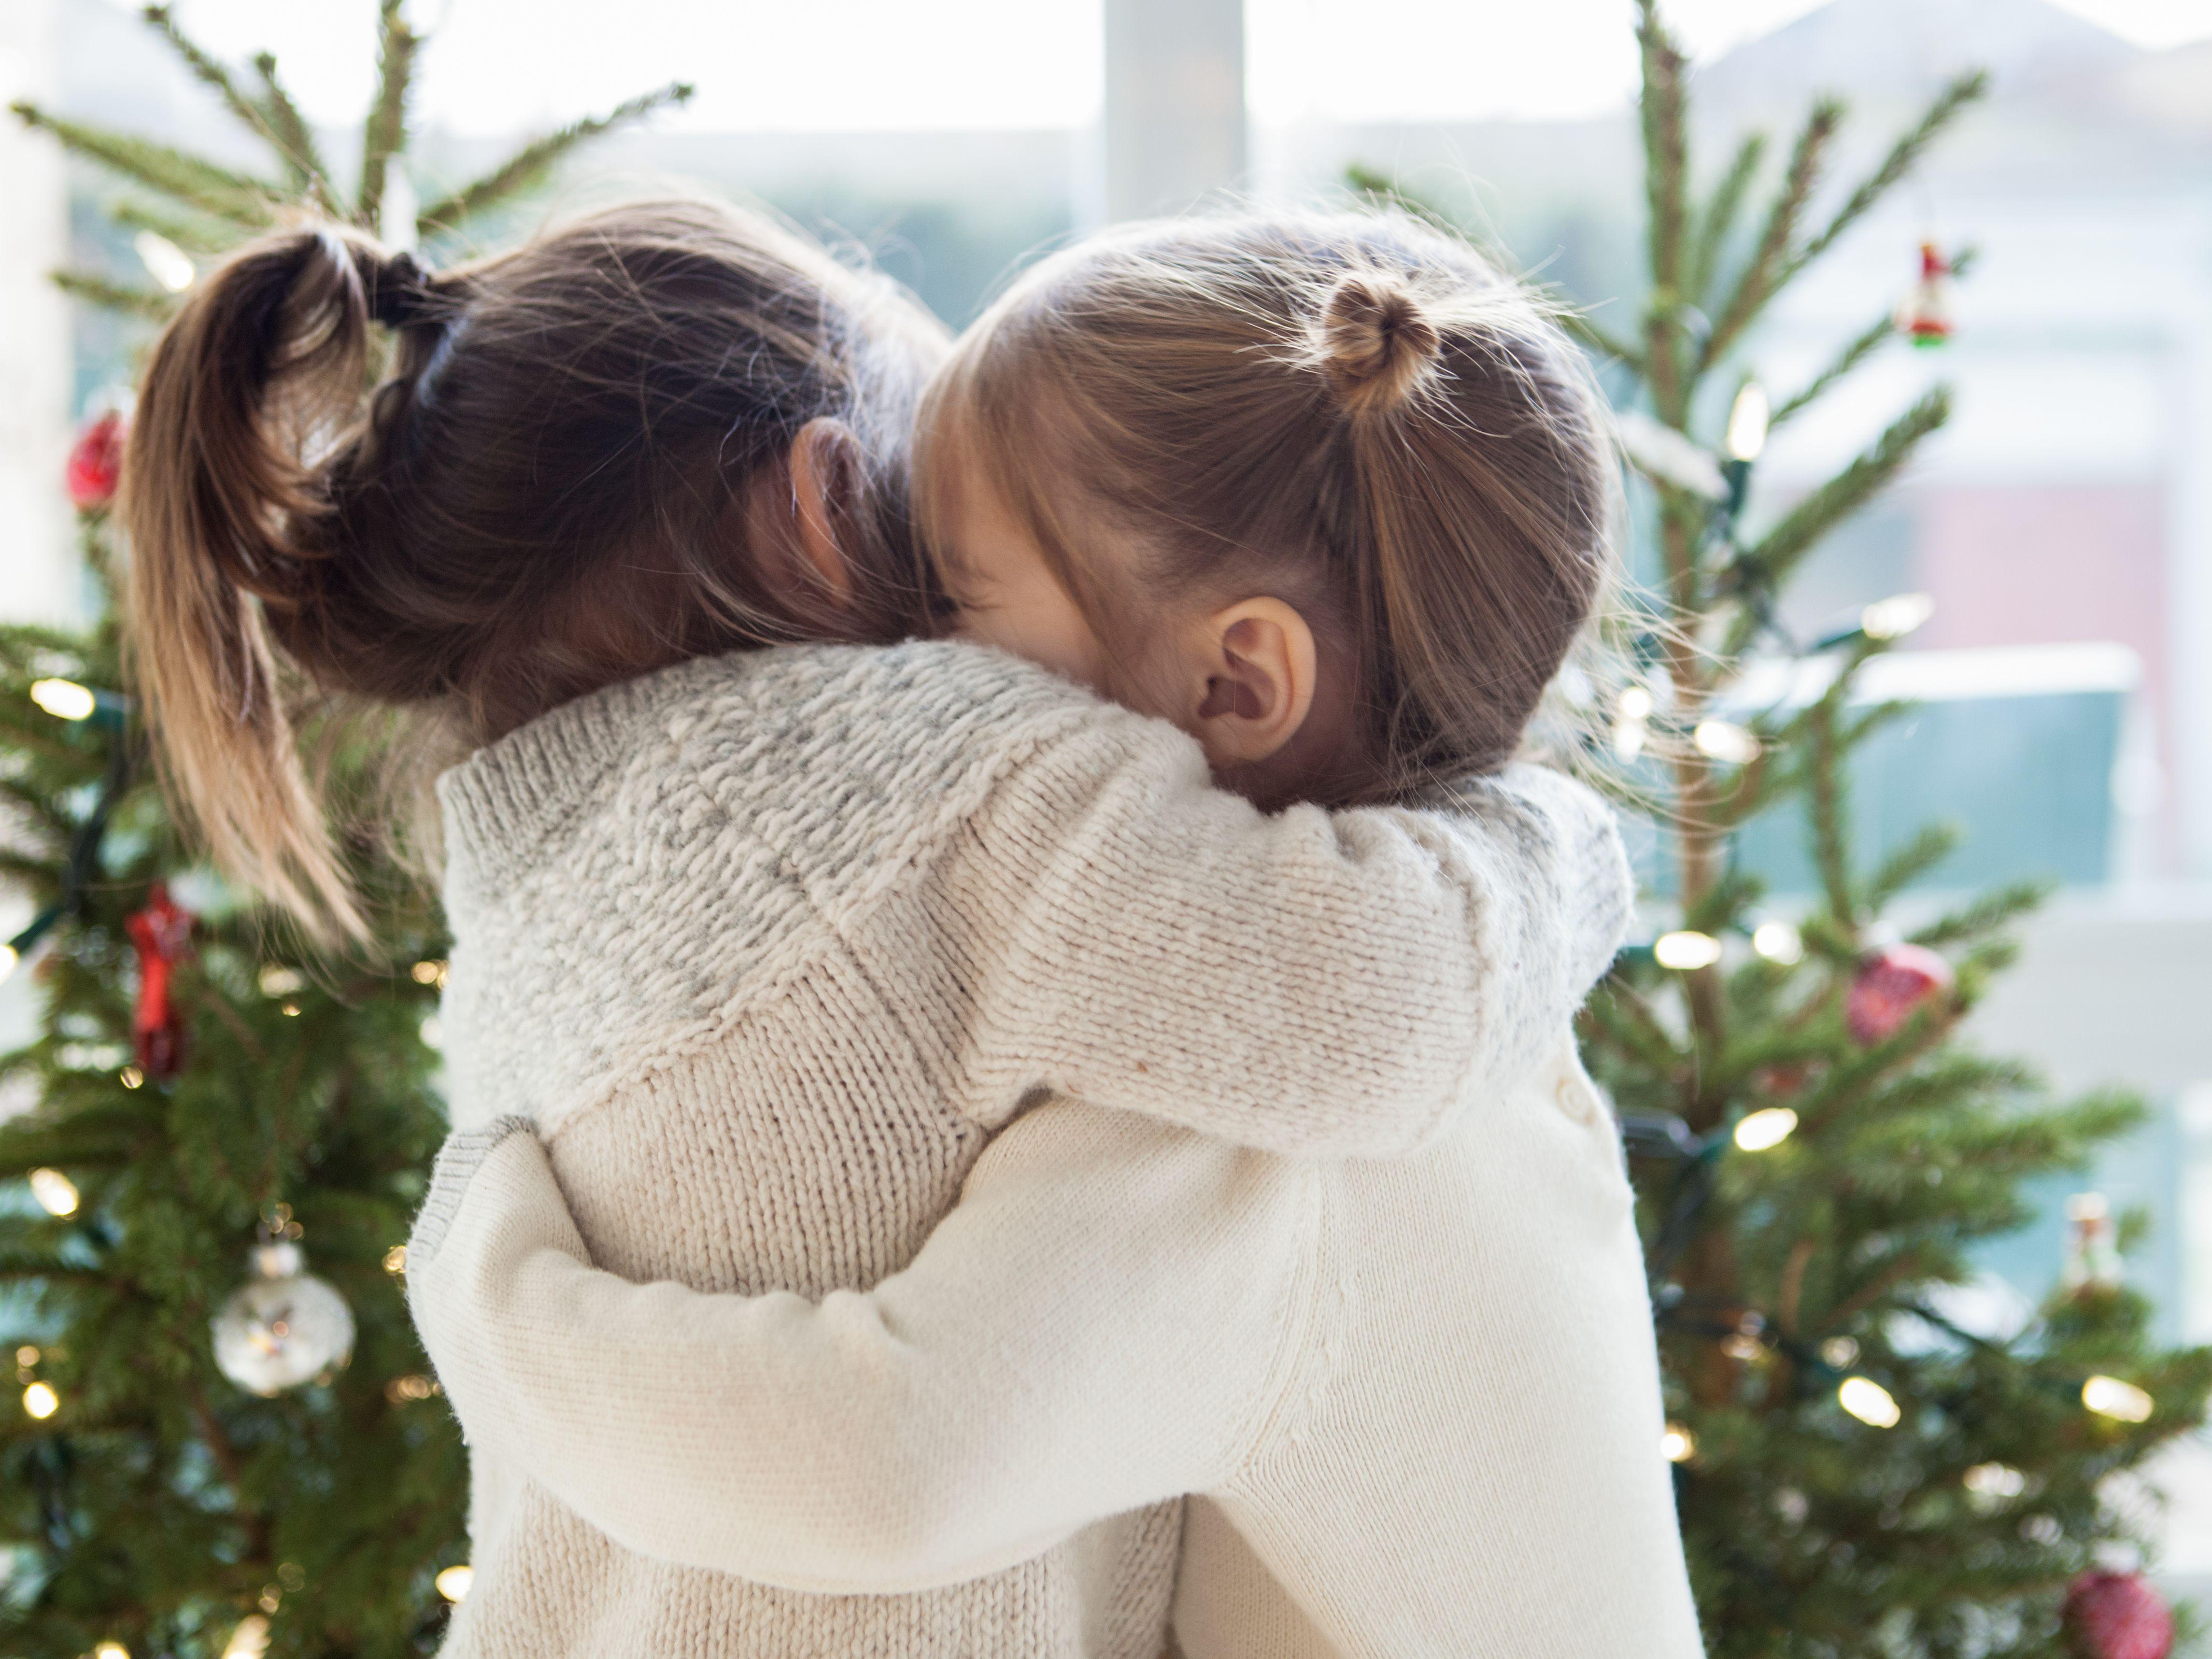 16 Inspirational Christmas Quotes